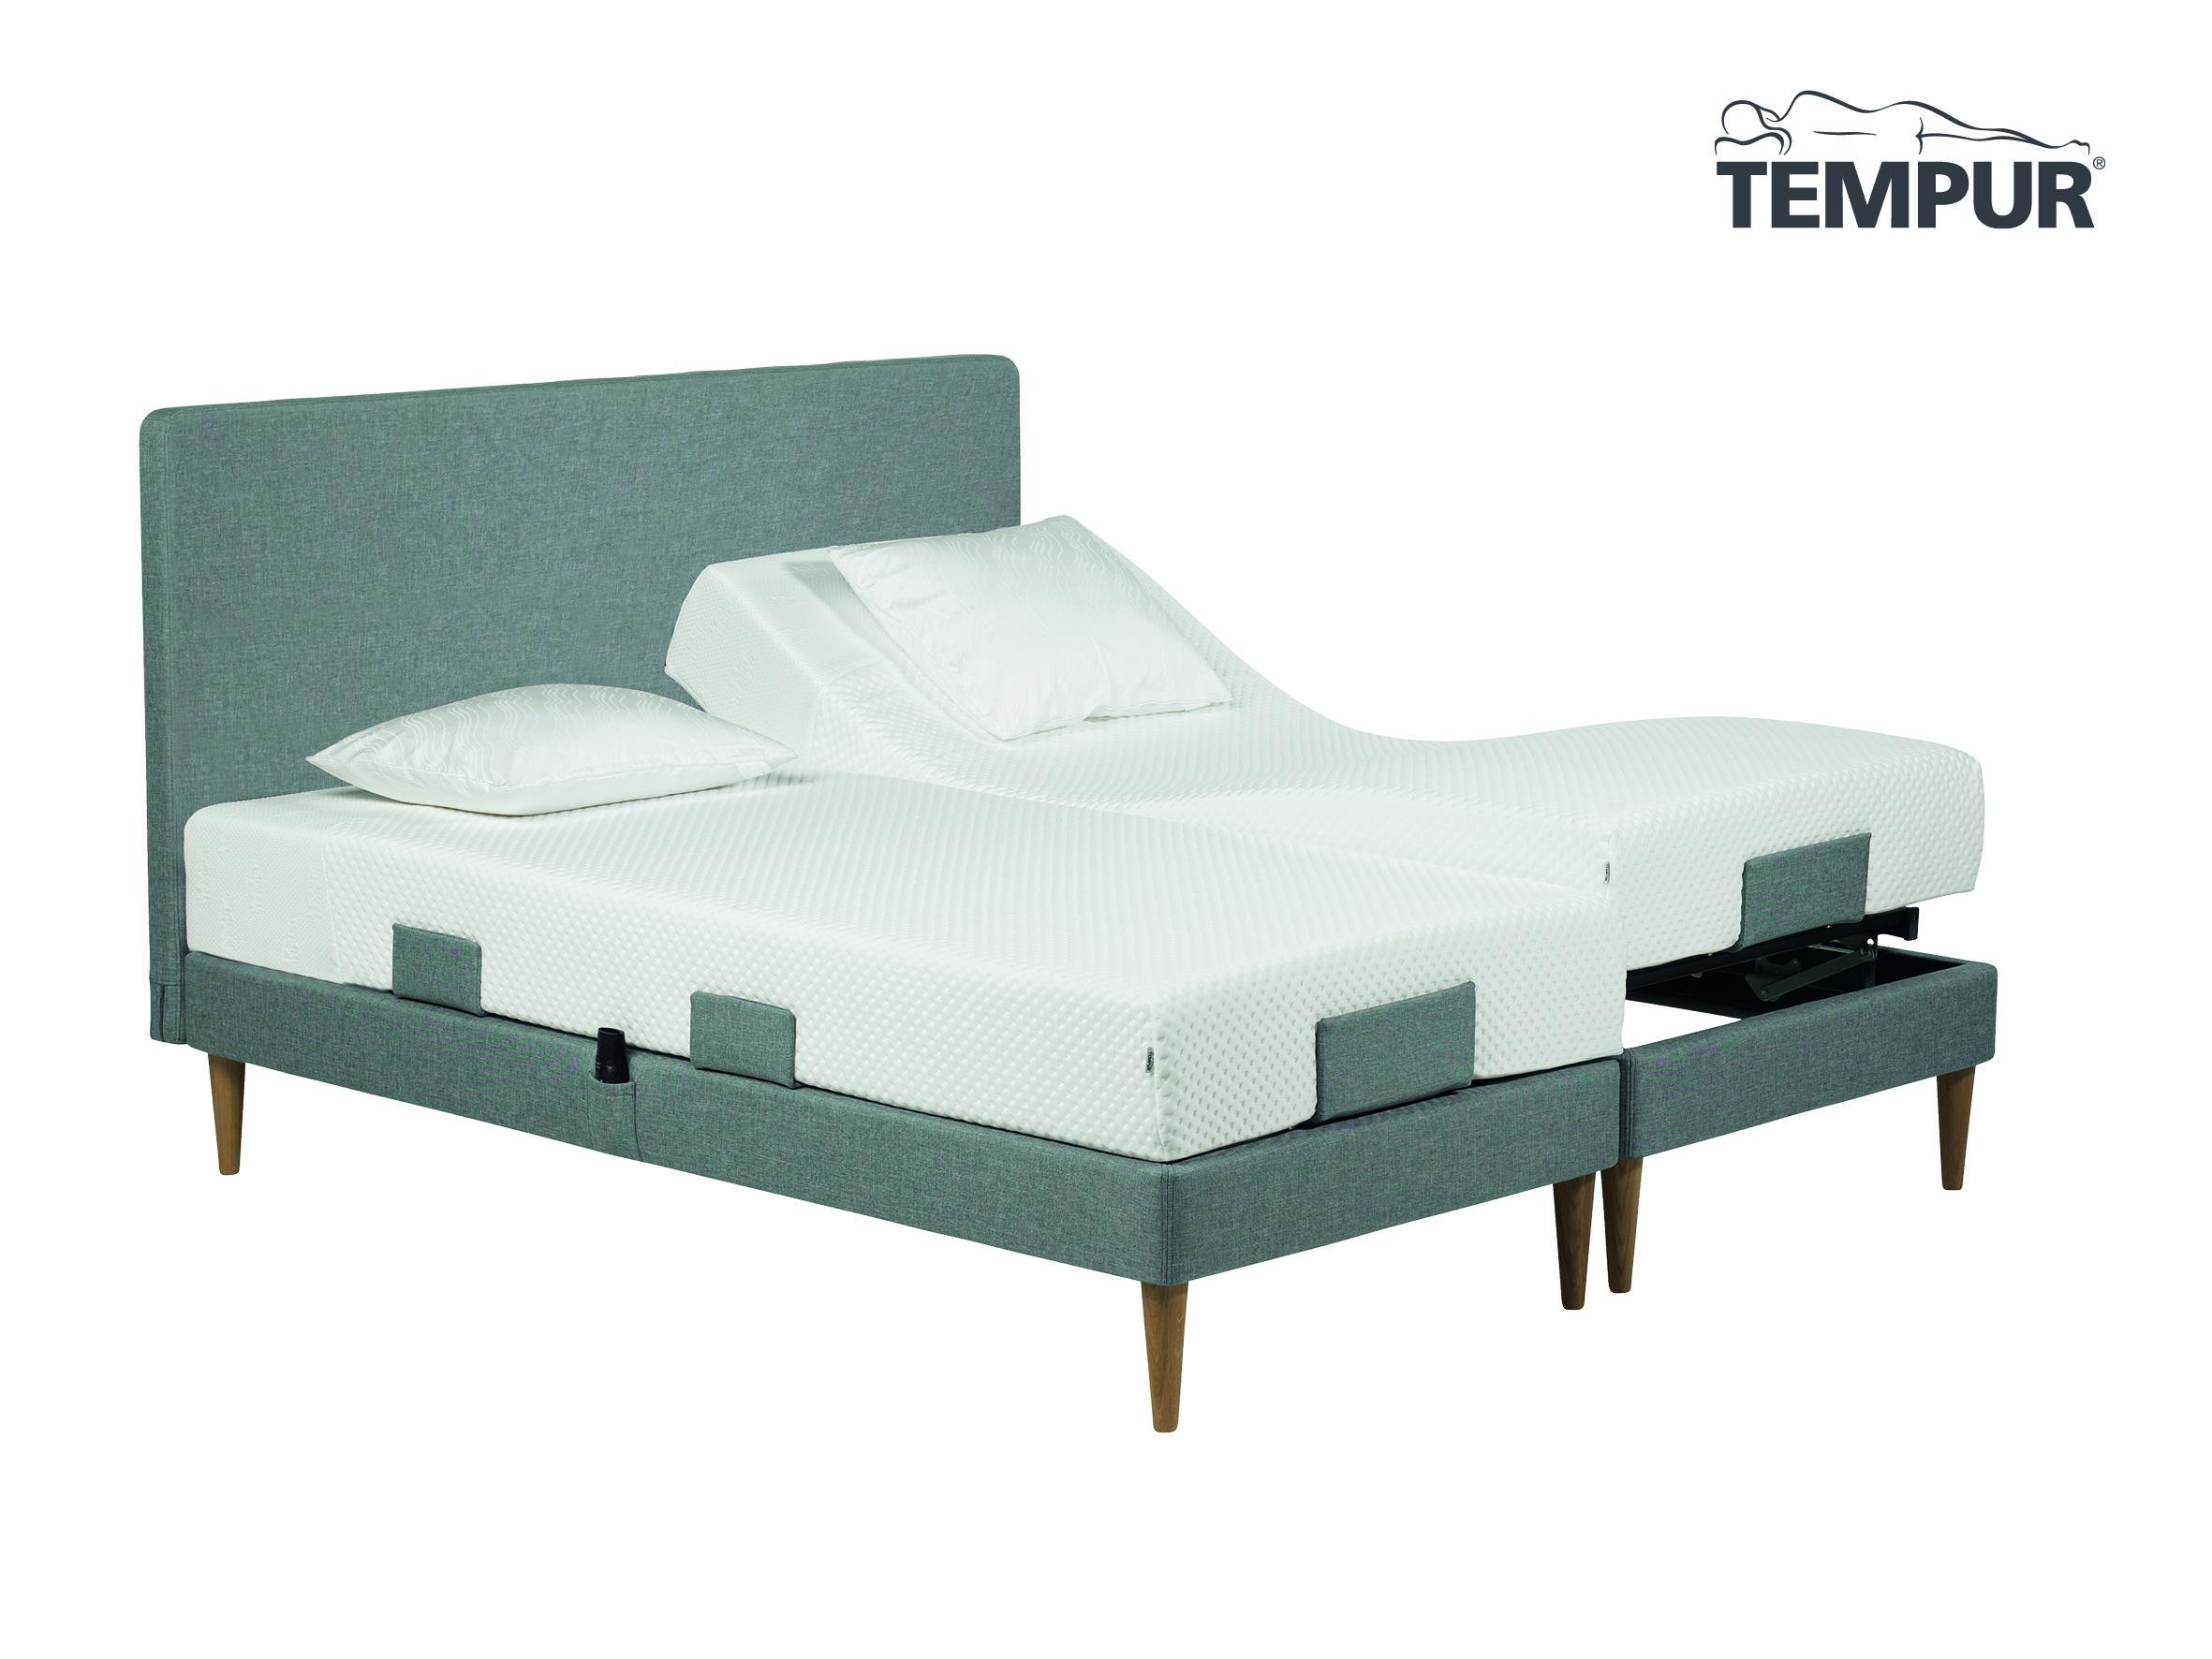 tempur move 180x200 cm inkl 21 cm tempurmadras danbo. Black Bedroom Furniture Sets. Home Design Ideas